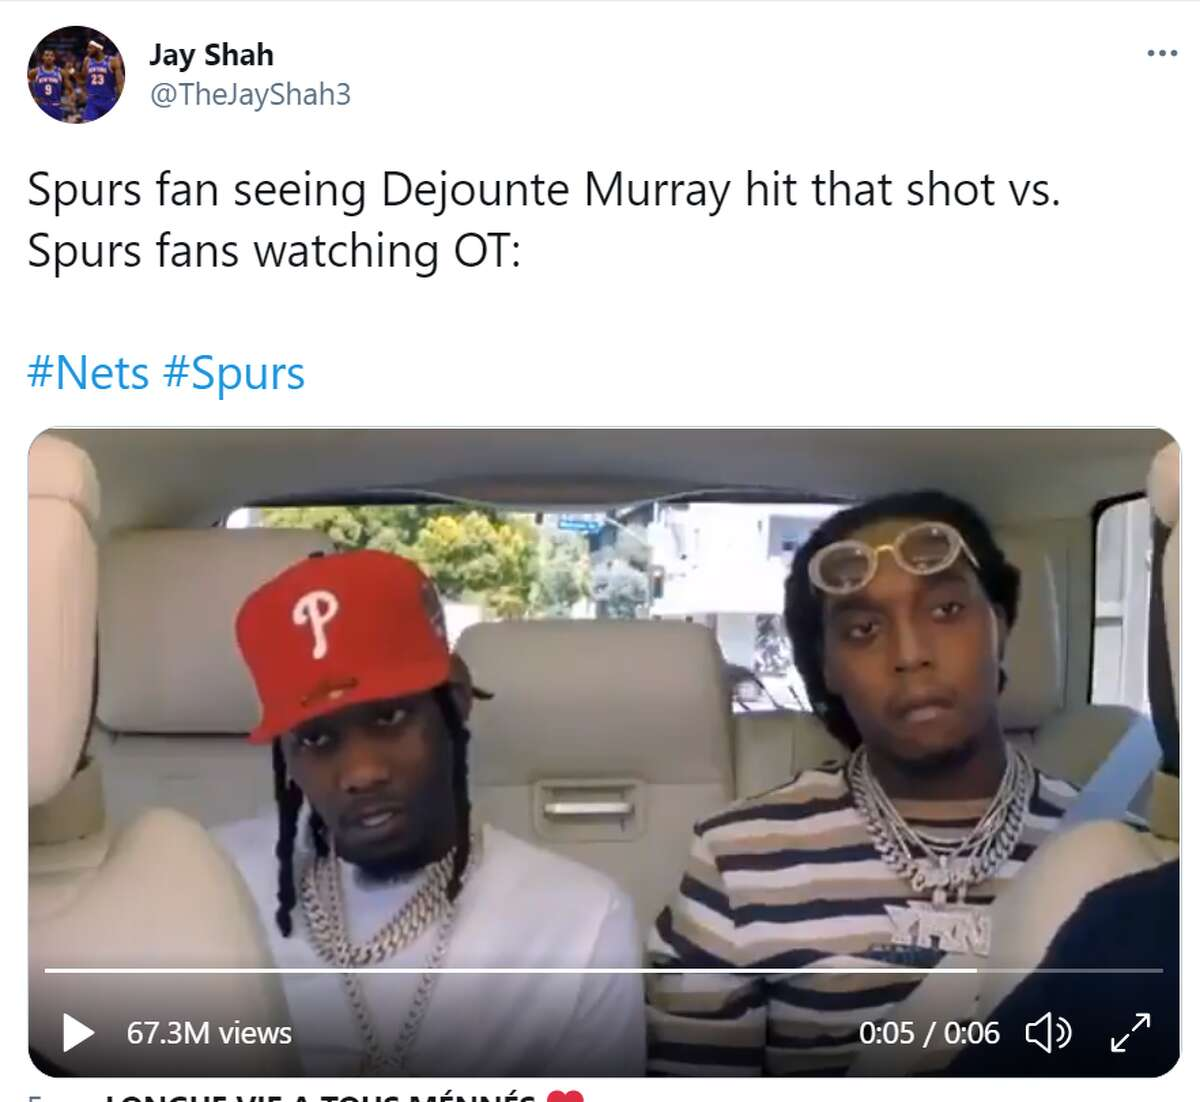 vs. Spurs fans watching OT